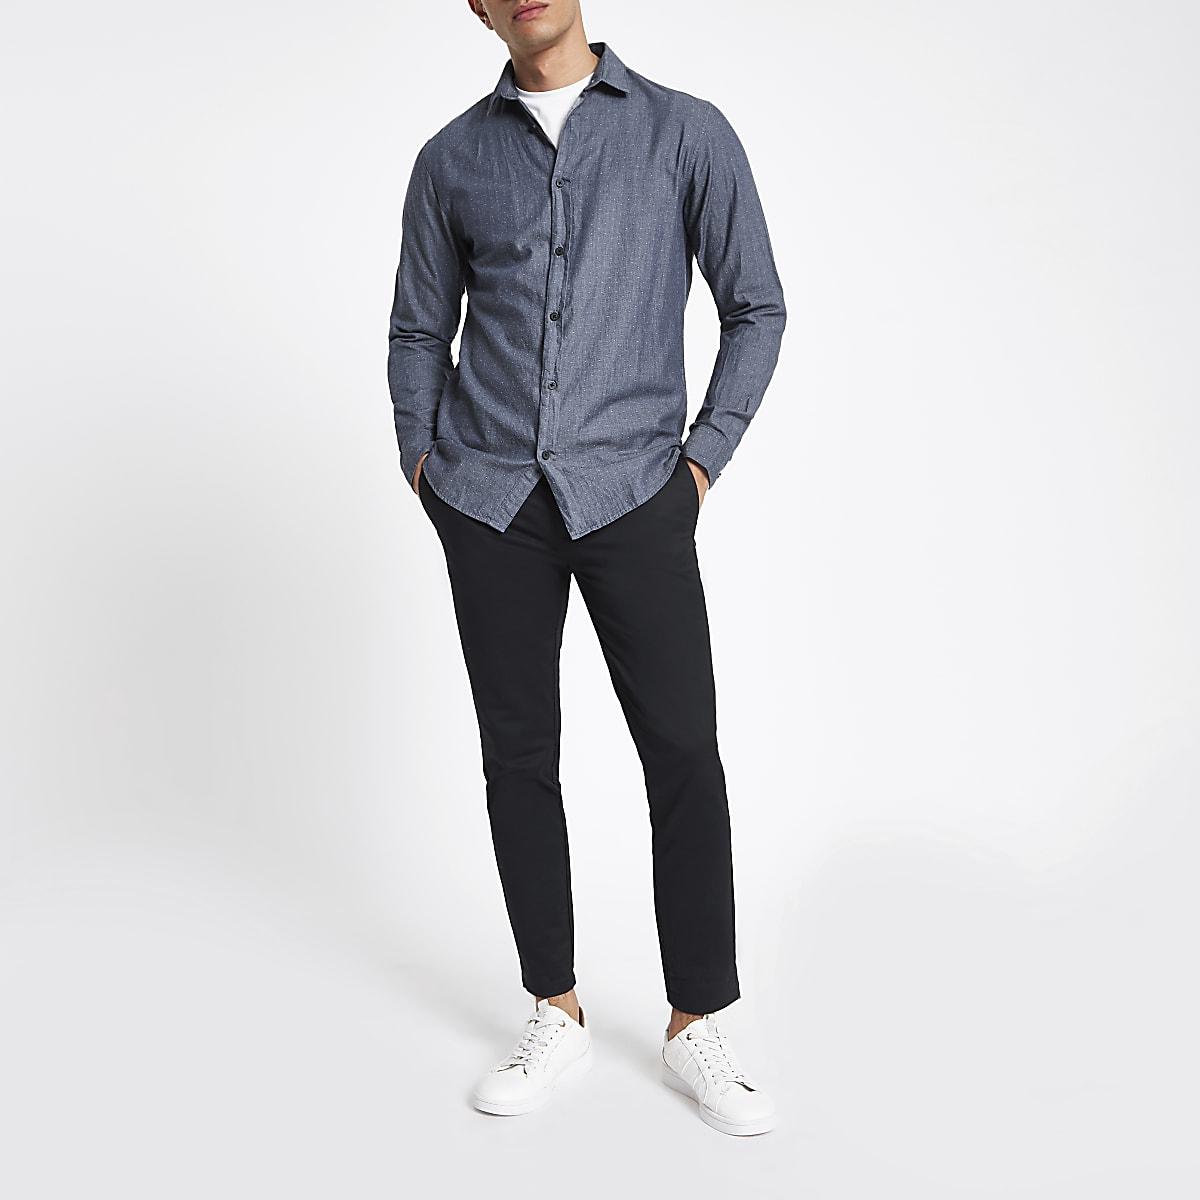 Donkerblauw Overhemd.Selected Homme Donkerblauw Overhemd Overhemden Met Lange Mouwen